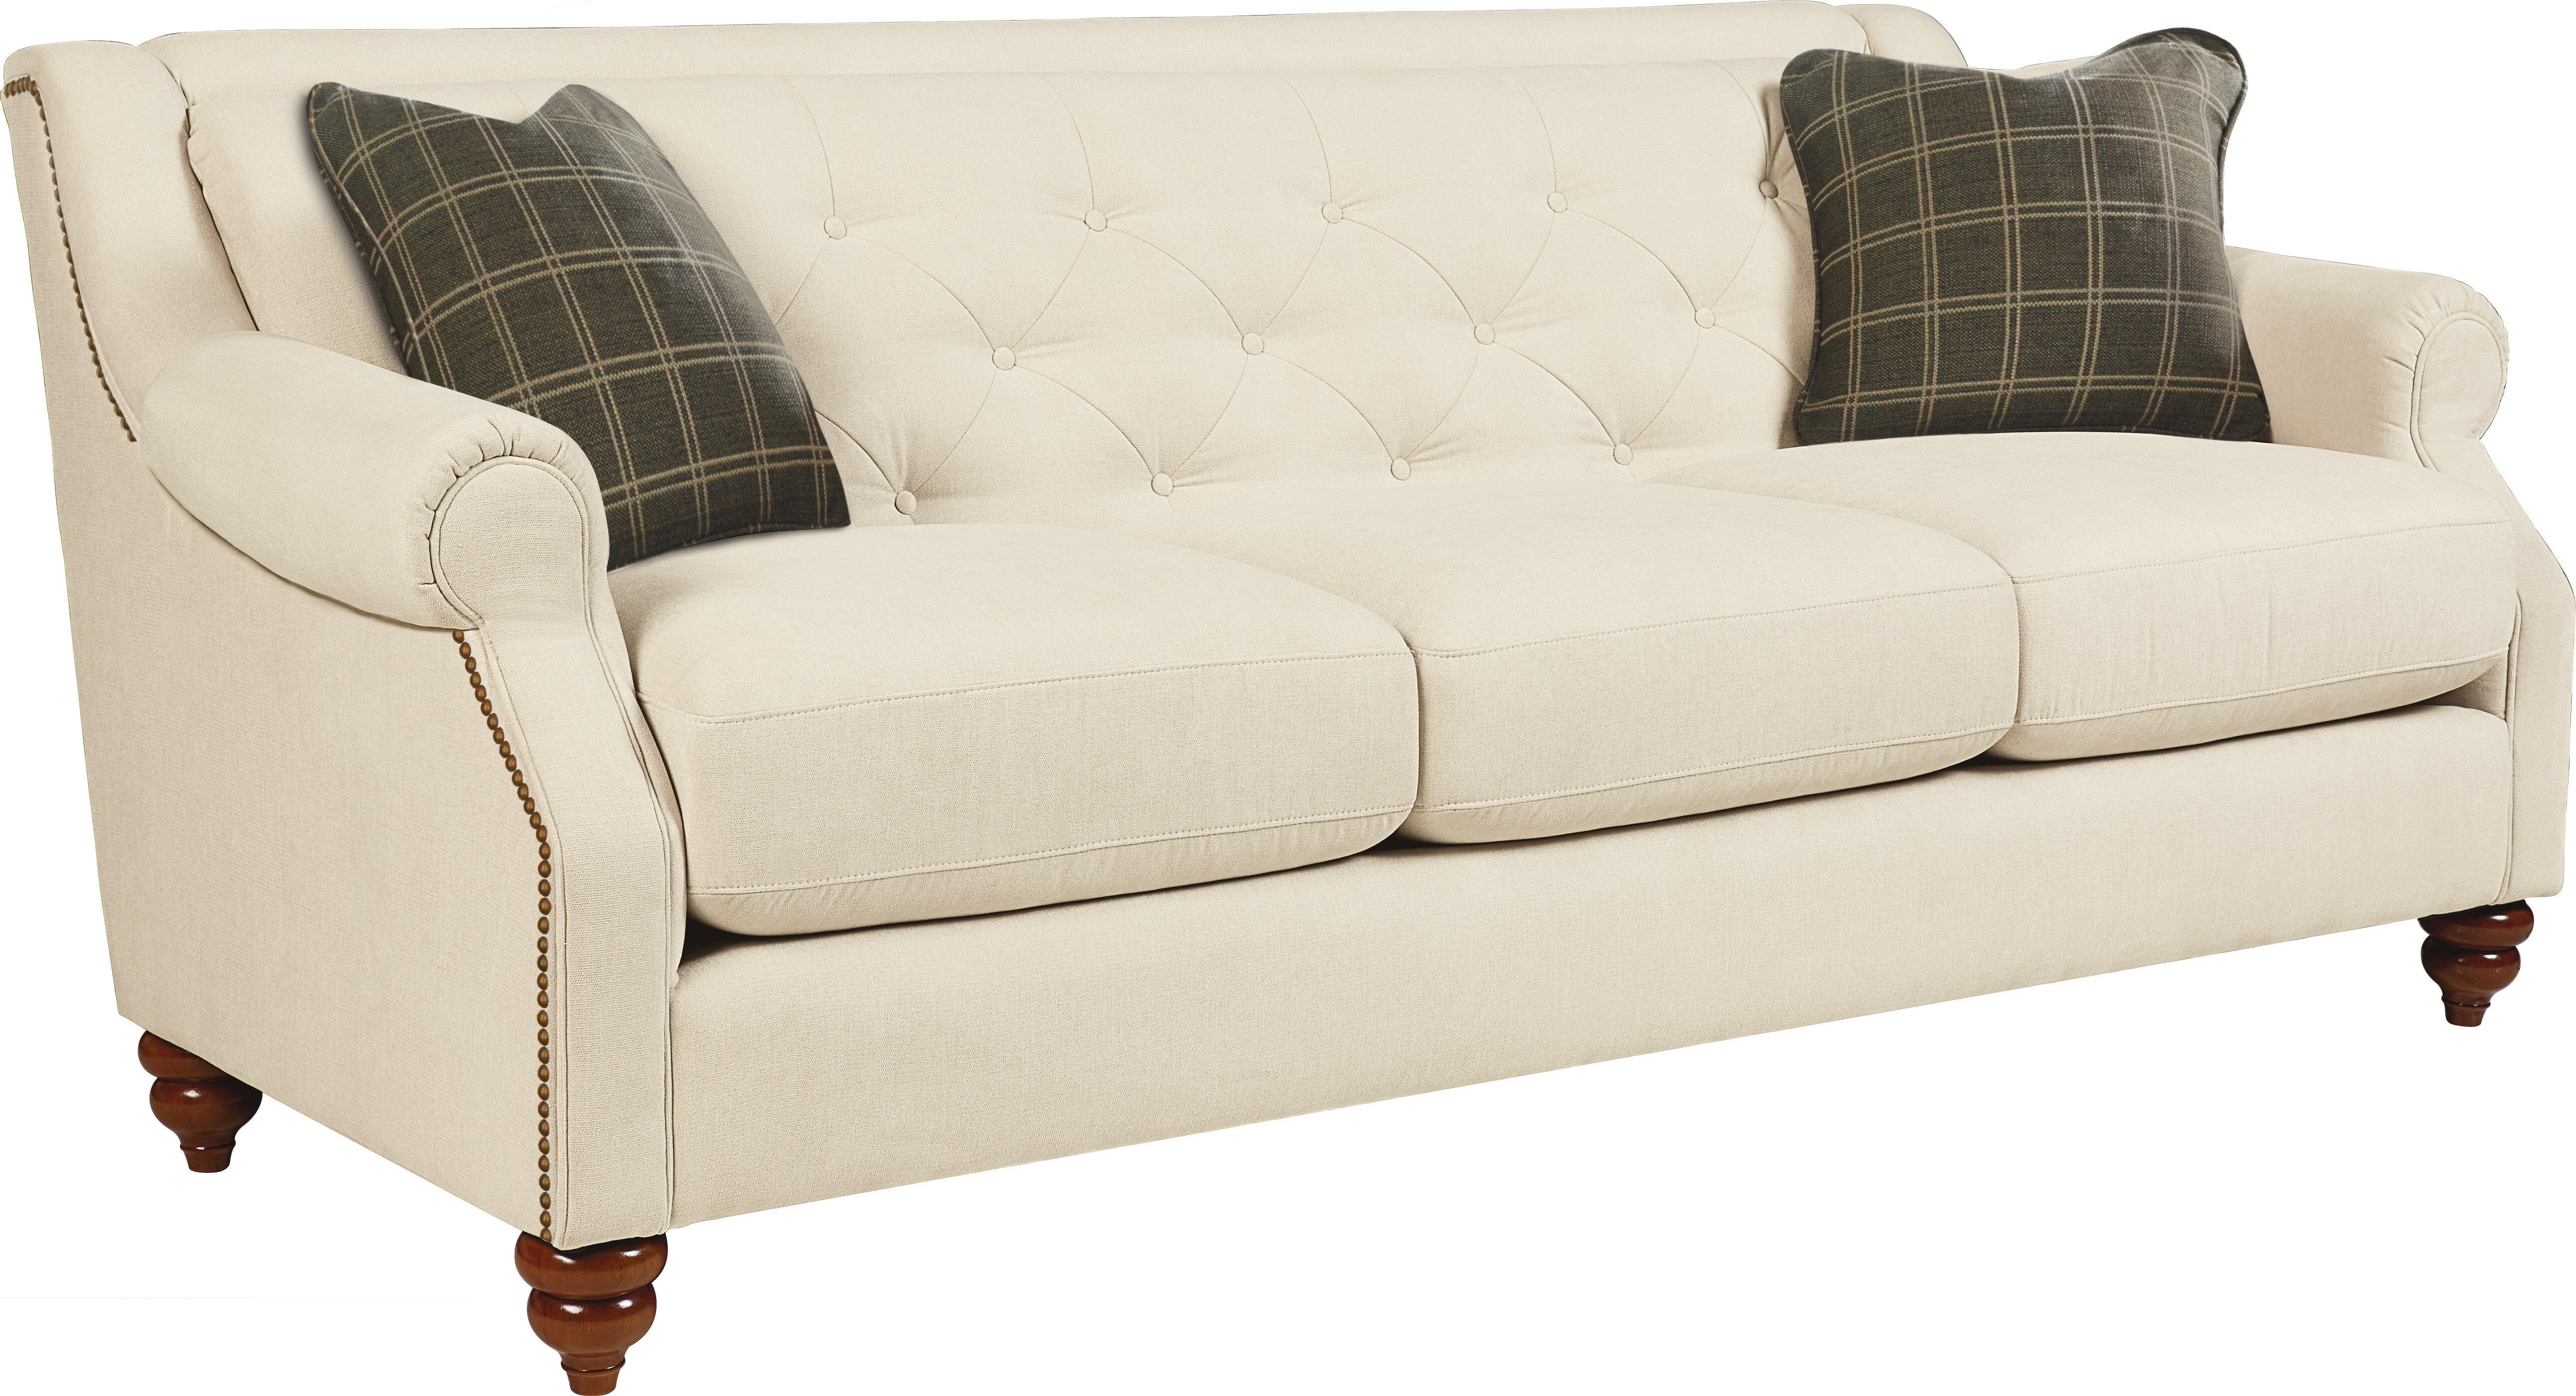 Delicieux La Z Boy Aberdeen Sofa | Wayfair